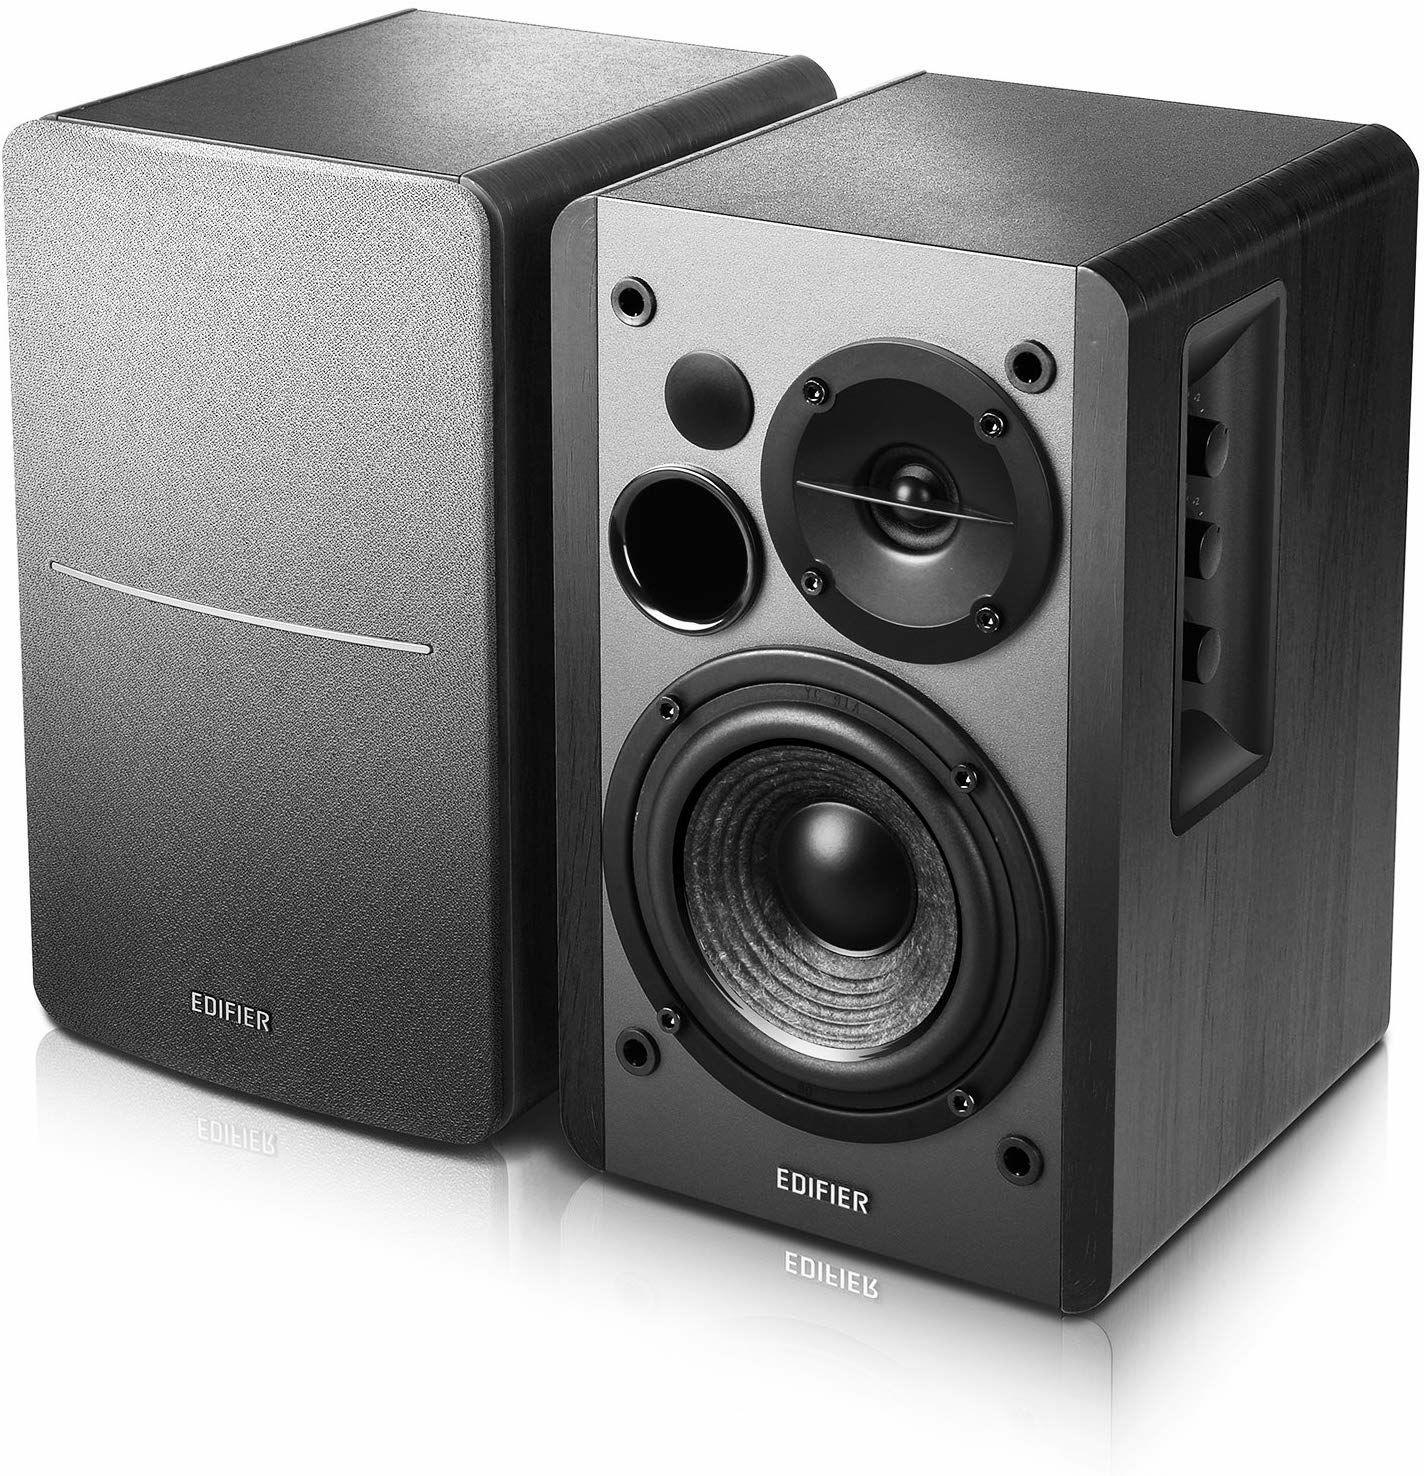 Edifier R1280DB: 2.0 Lautsprecher-System (2x 21W RMS, 10,16cm Tieftöner, Bluetooth, IR Fernbedienung, 2x RCA)